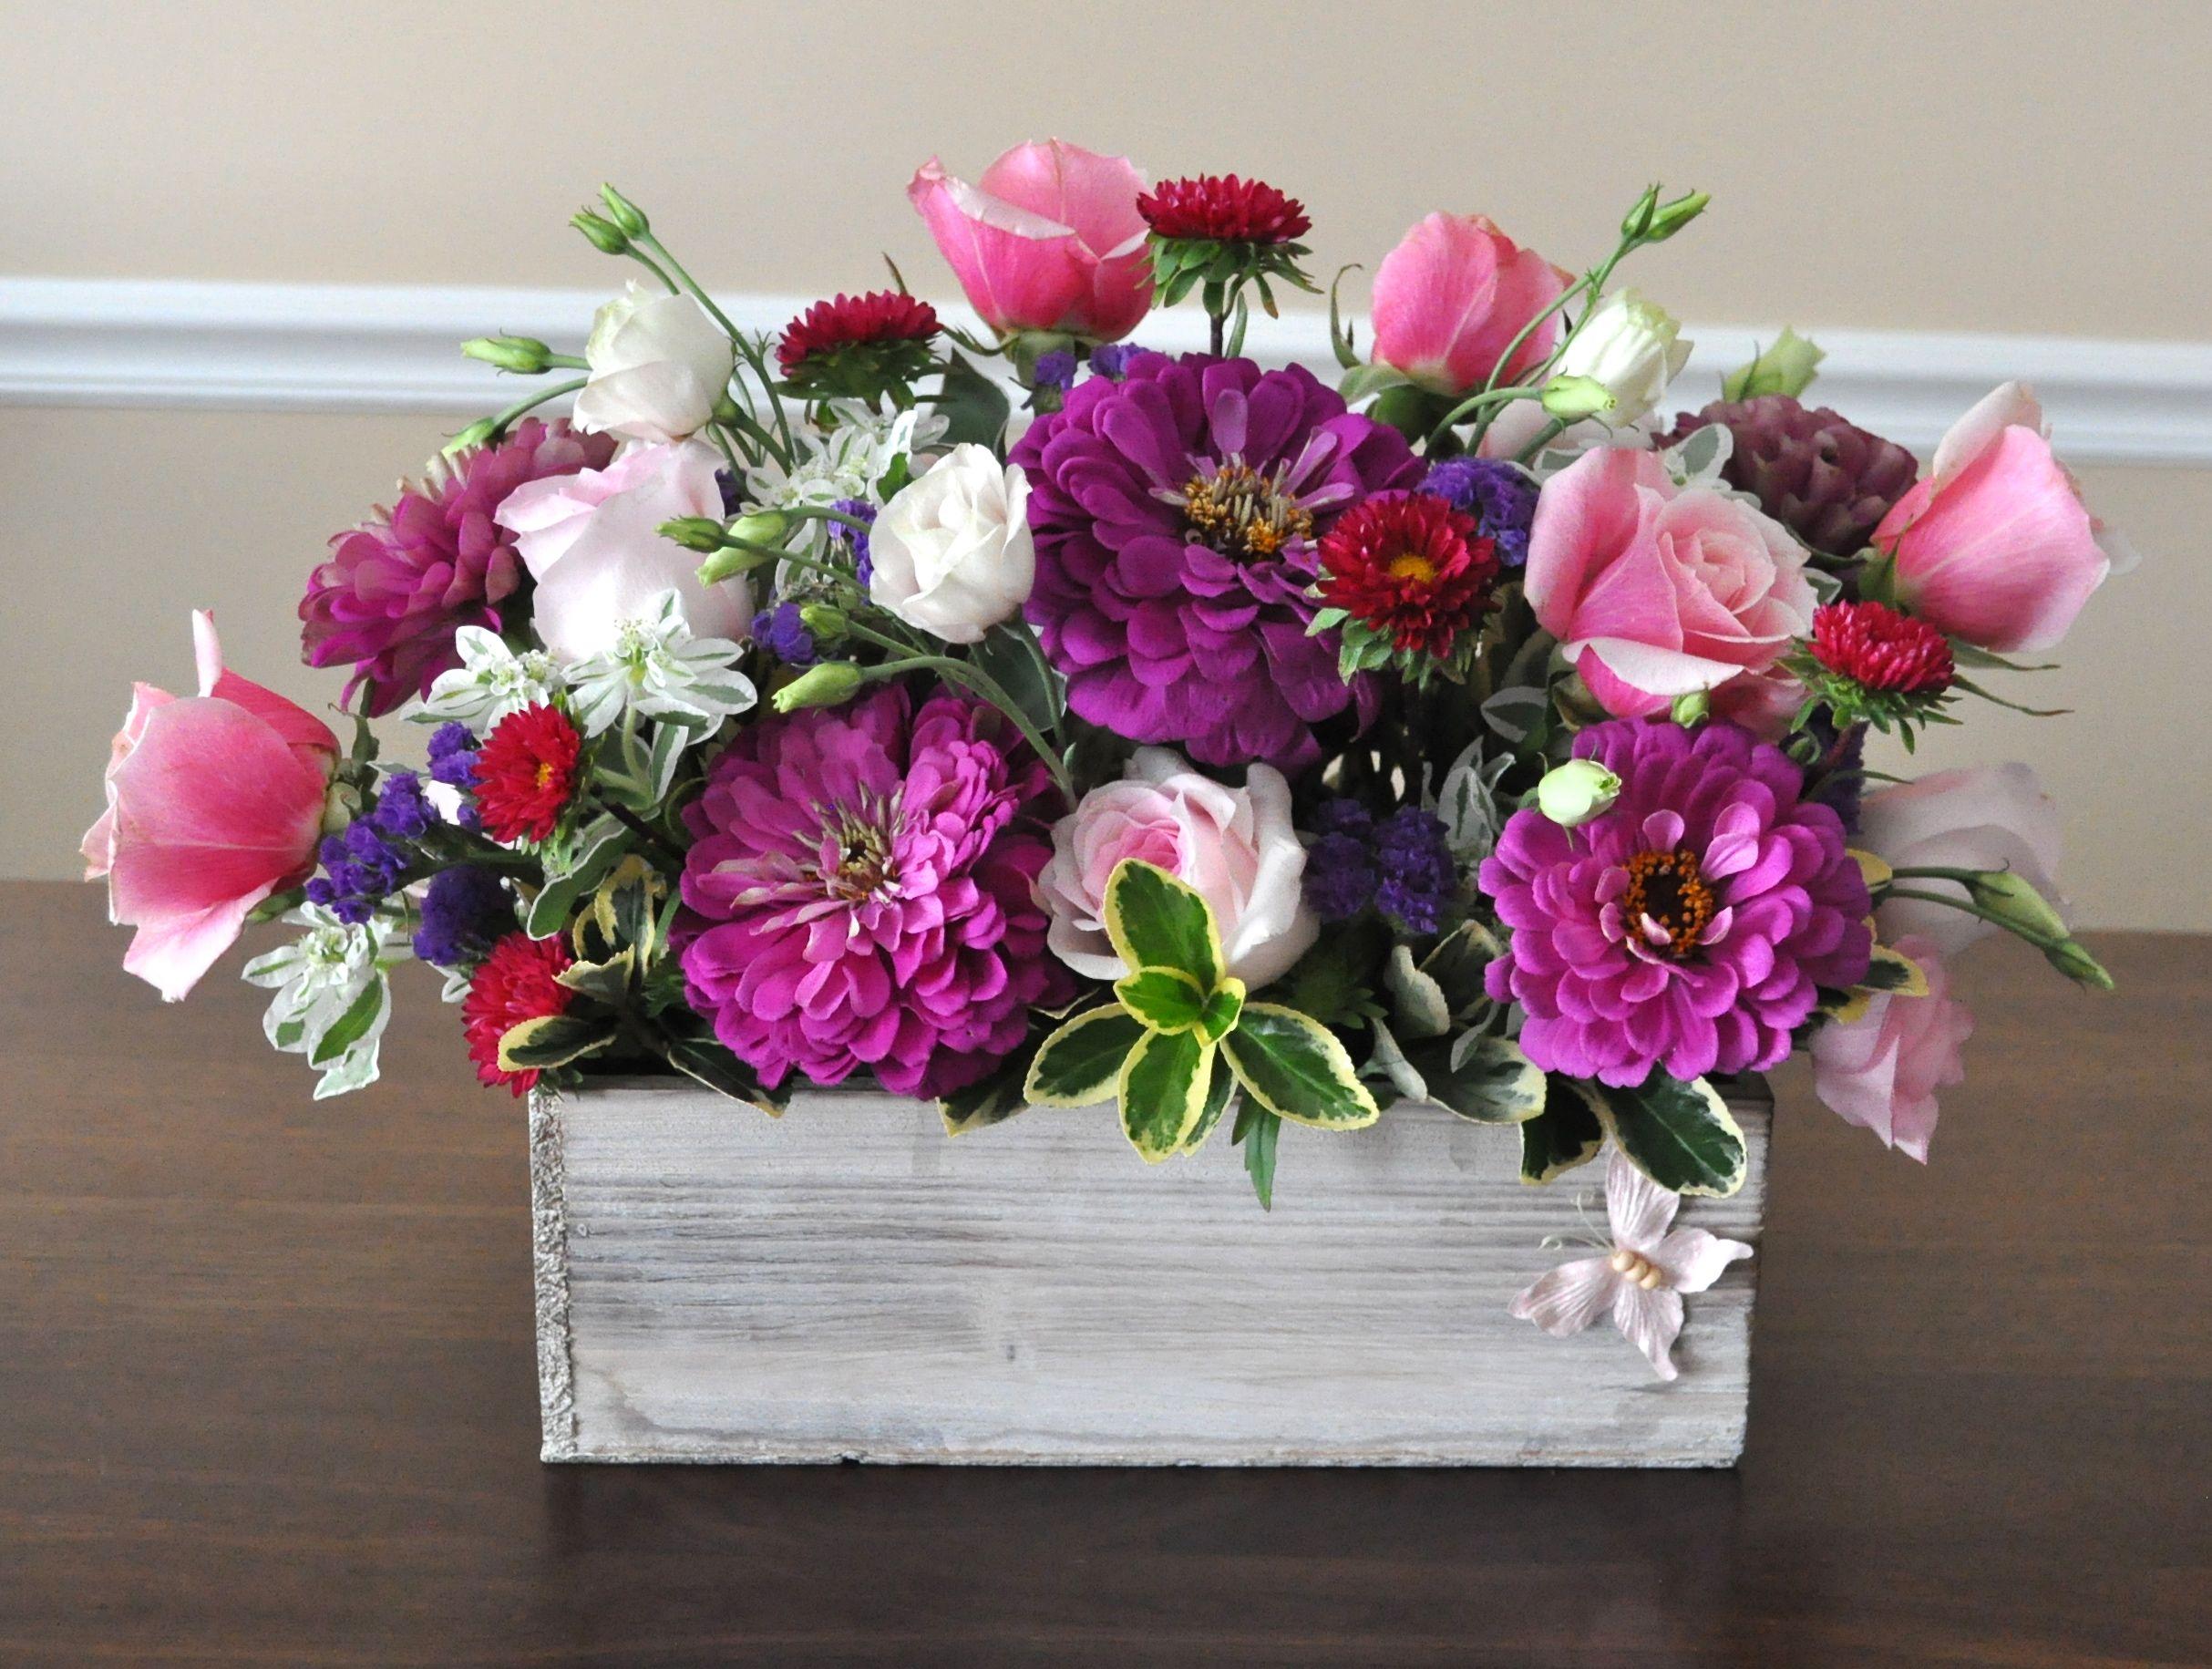 Postwedding celebration centerpiece. Fresh flowers